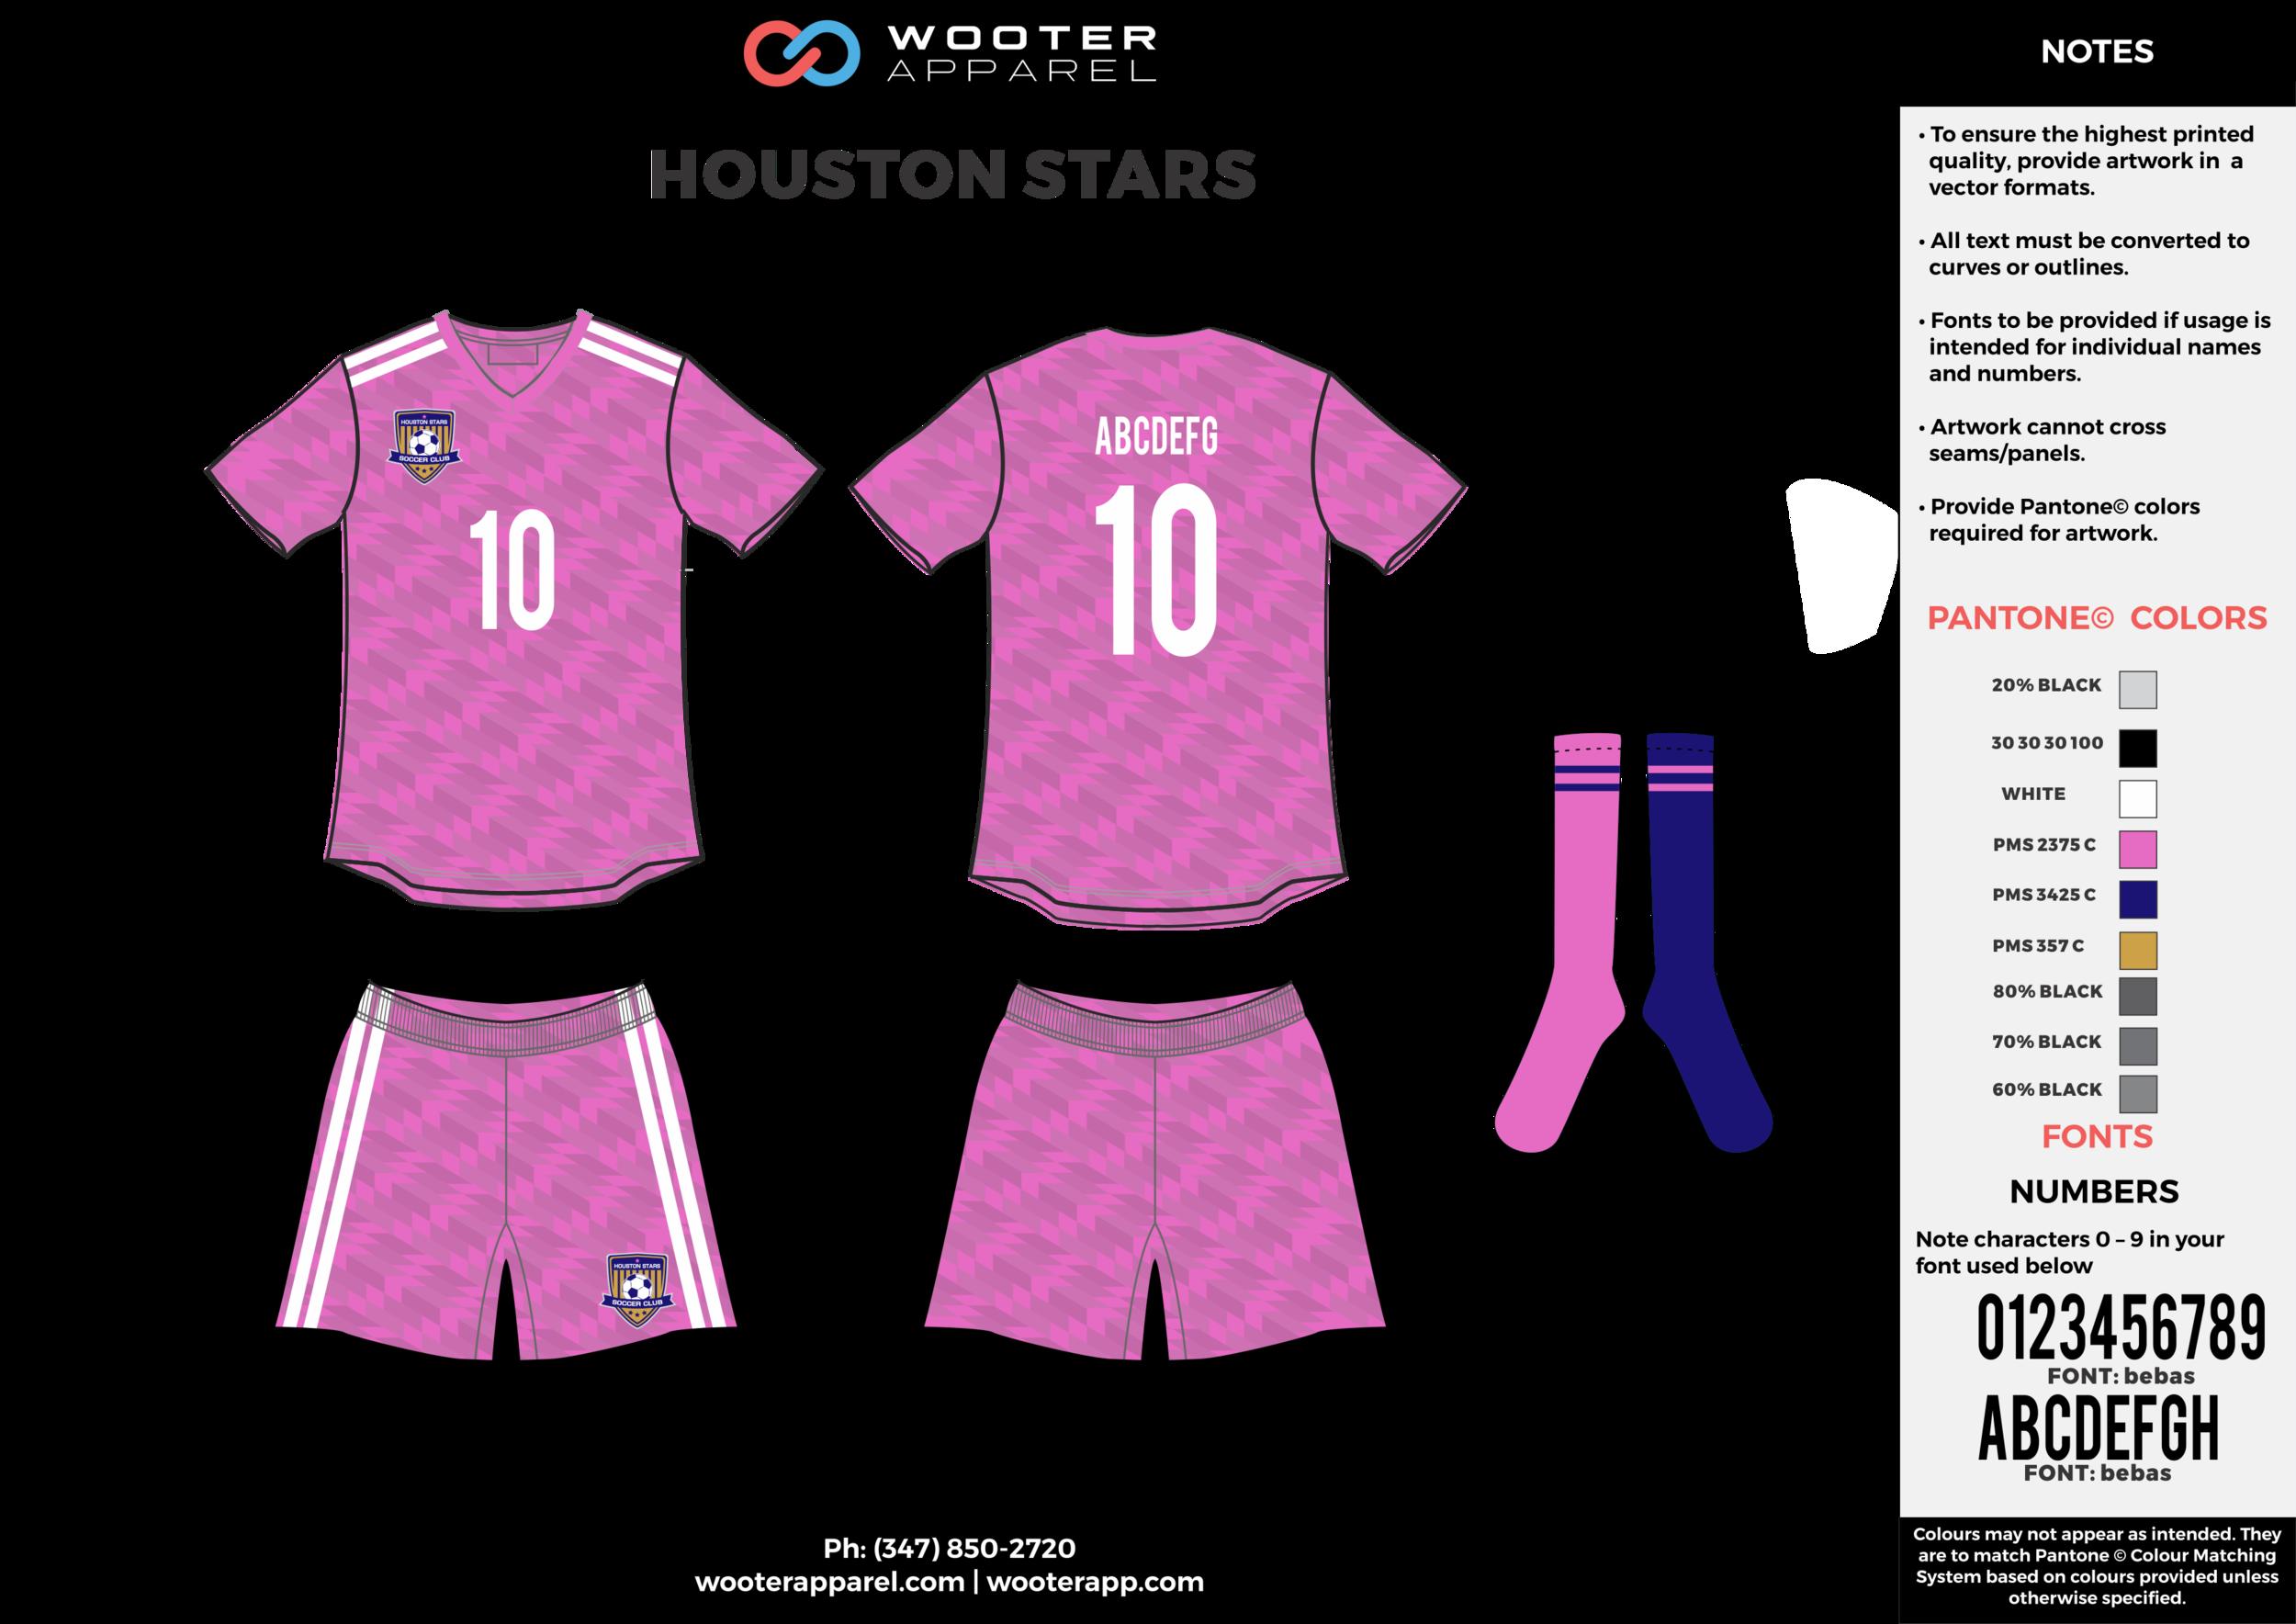 HOUSTON STARS pink white gray custom sublimated soccer uniform jersey shirt shorts socks